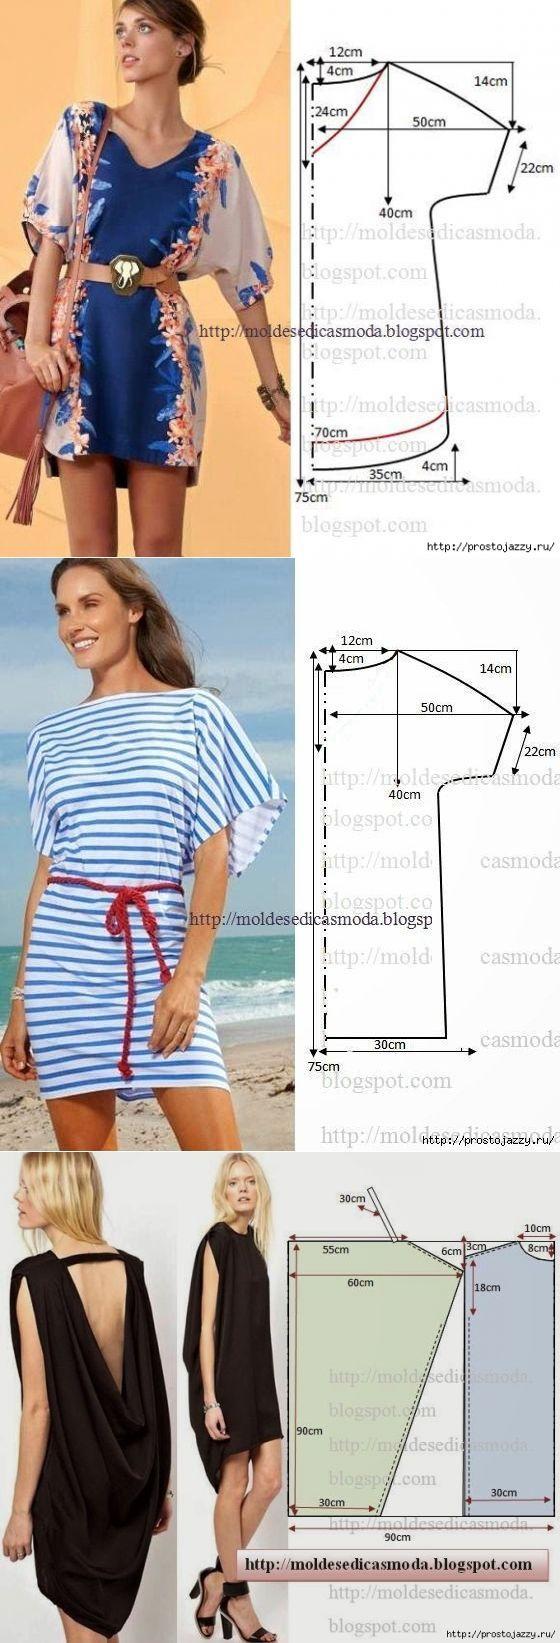 Фото и выкройки летних блузок